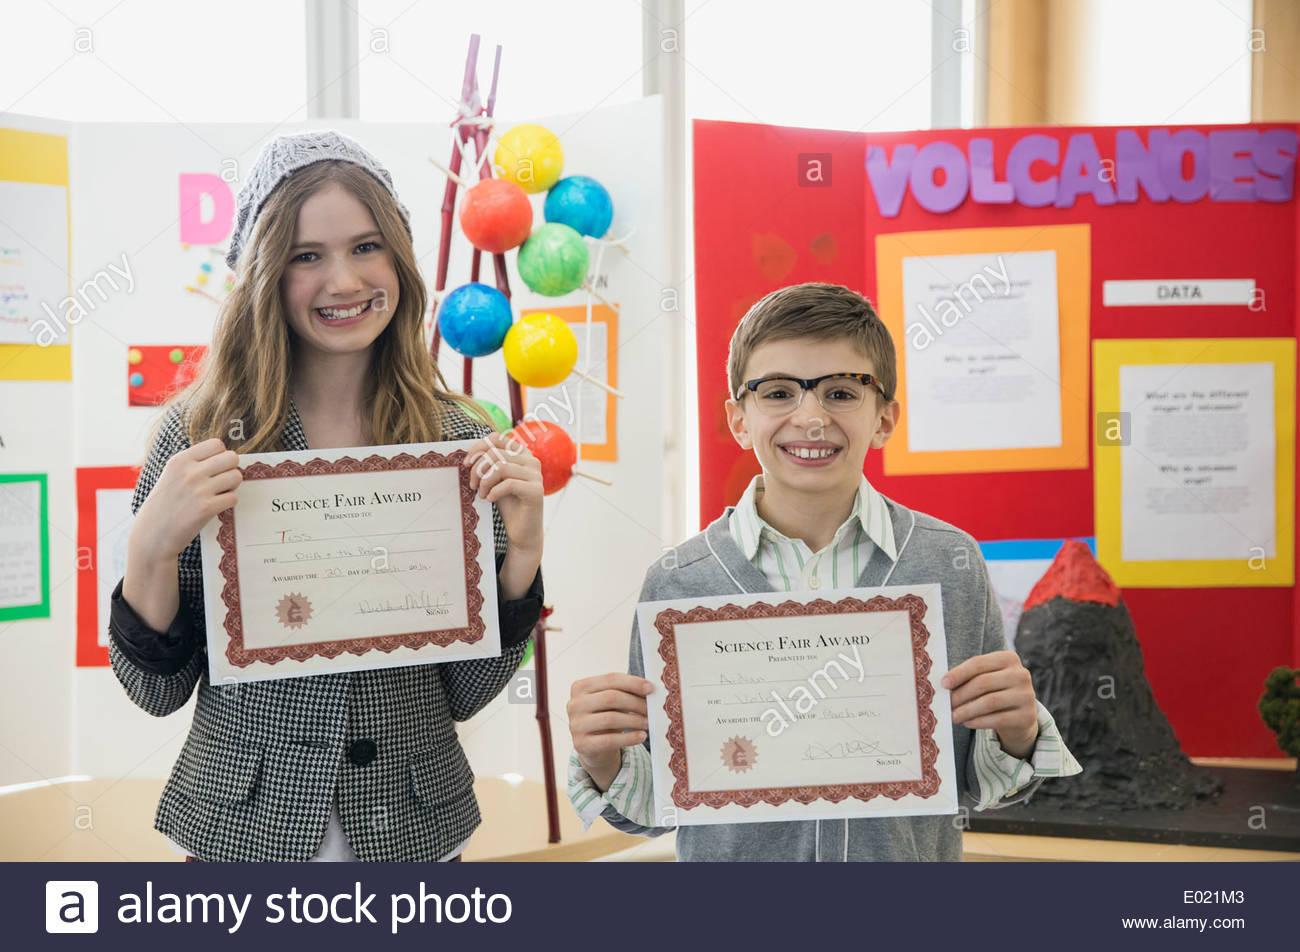 child of achievement awards stock photos  u0026 child of achievement awards stock images